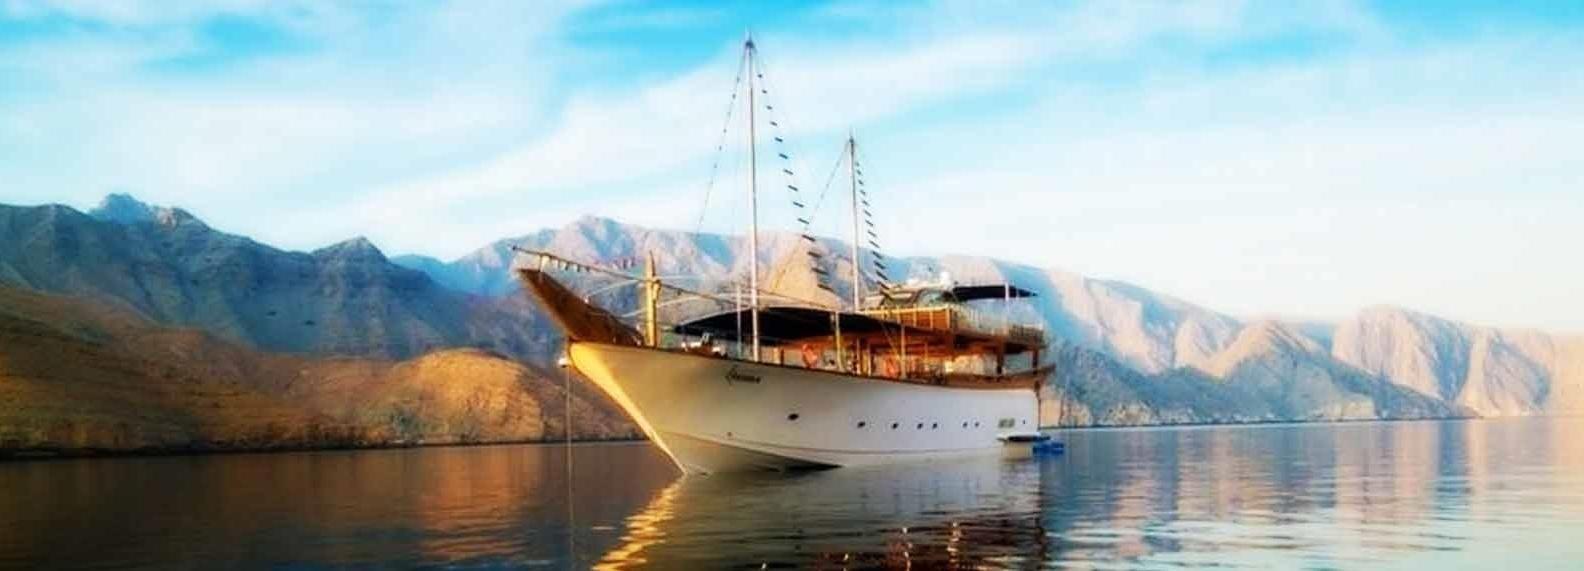 Khasab: Musandam Overnight Dhow Cruise